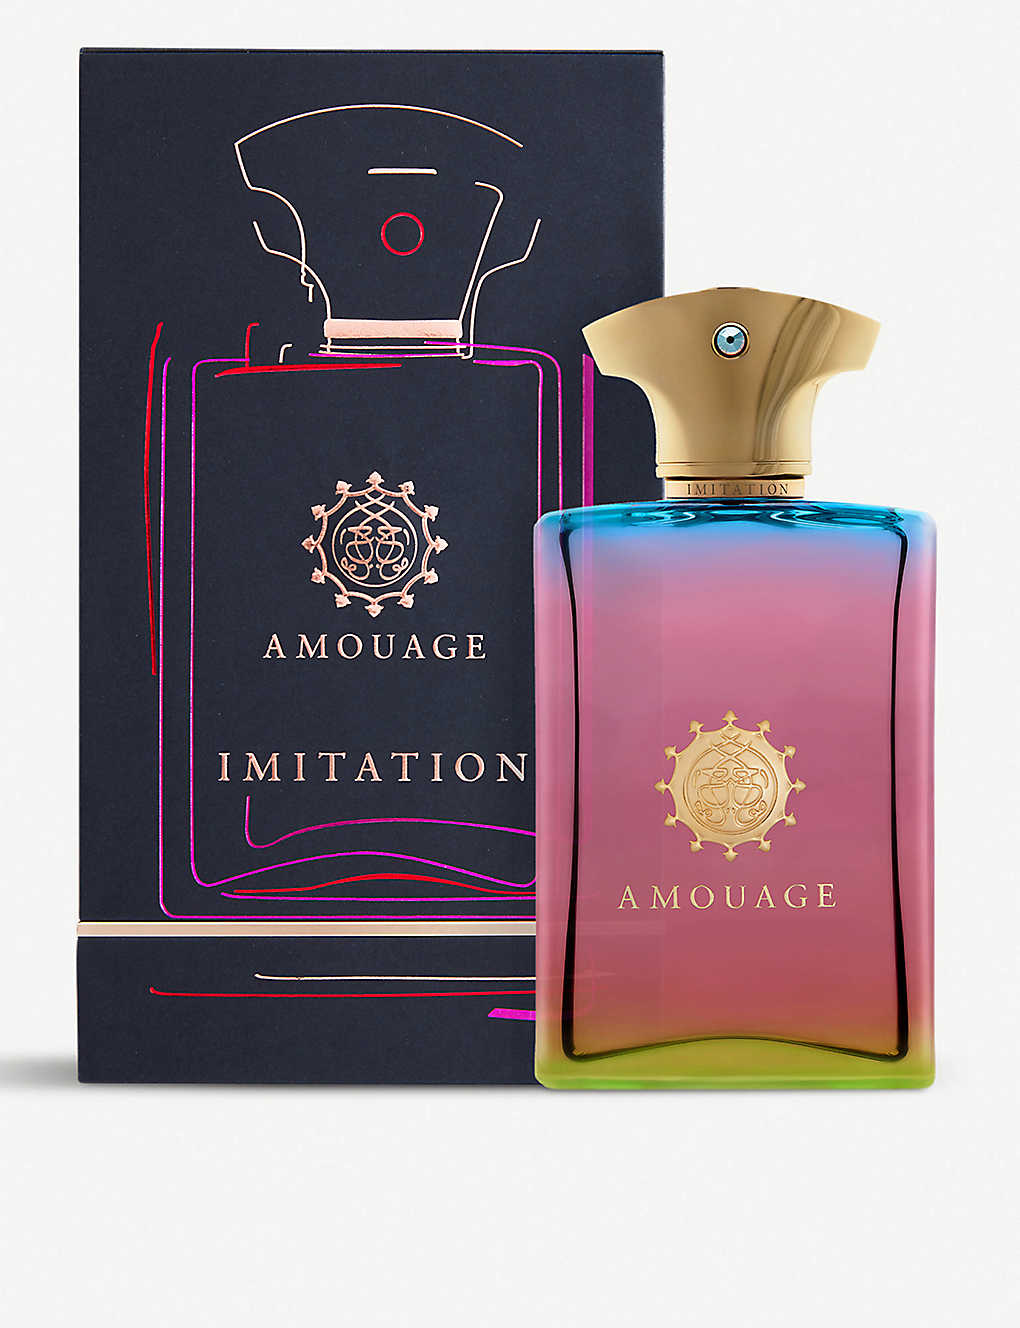 Amouage Imitation Man 100ml Eau De Parfum Selfridgescom